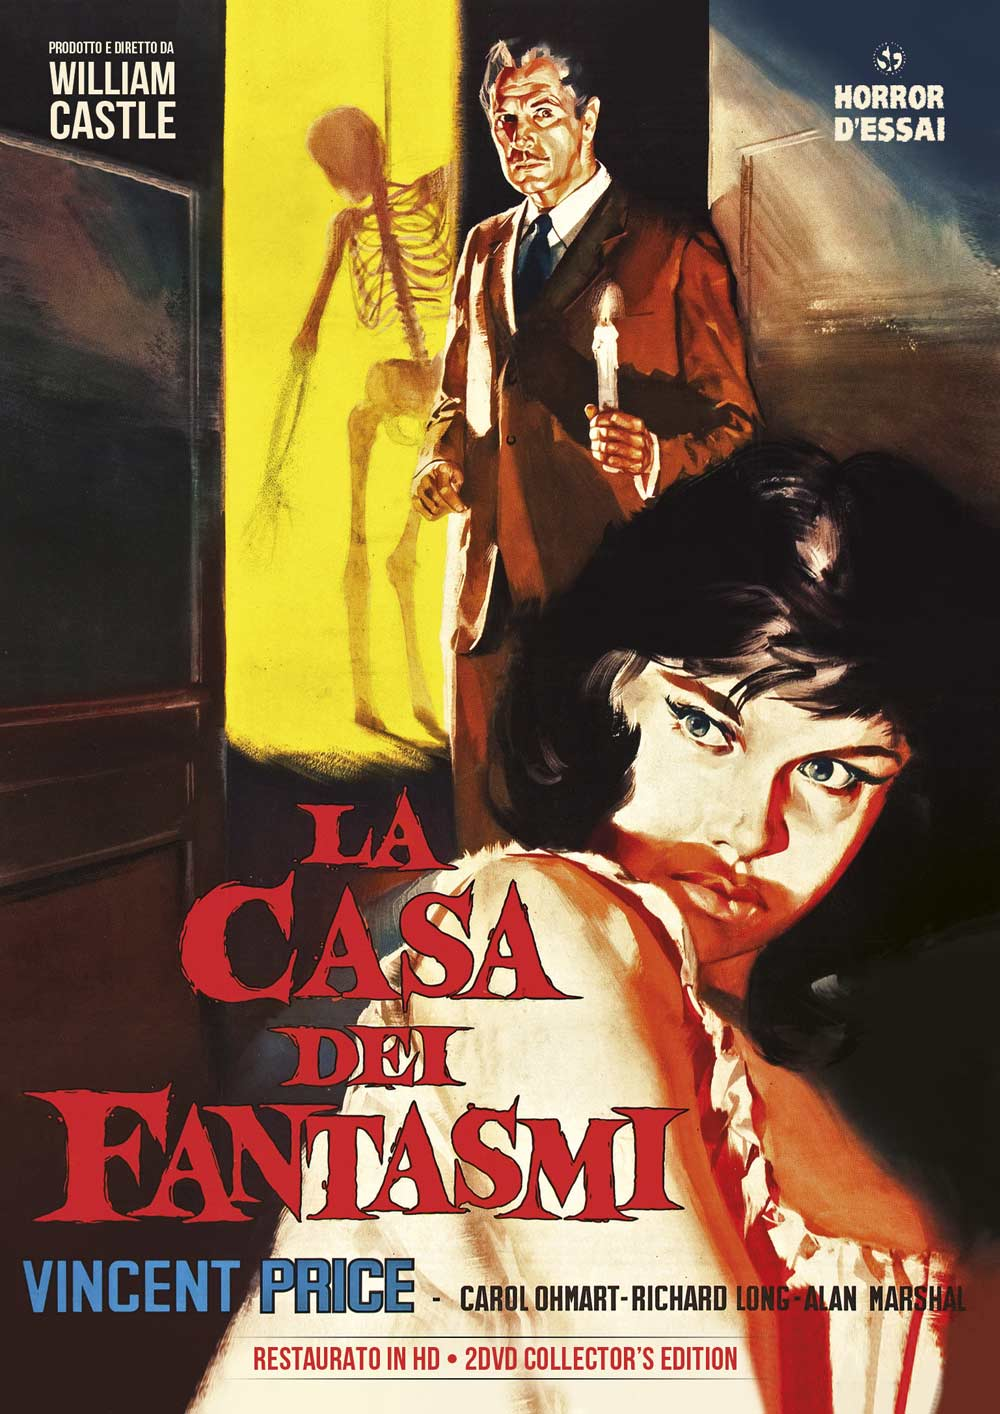 LA CASA DEI FANTASMI (RESTAURATO IN HD) (COLLECTOR'S EDITION 2 D